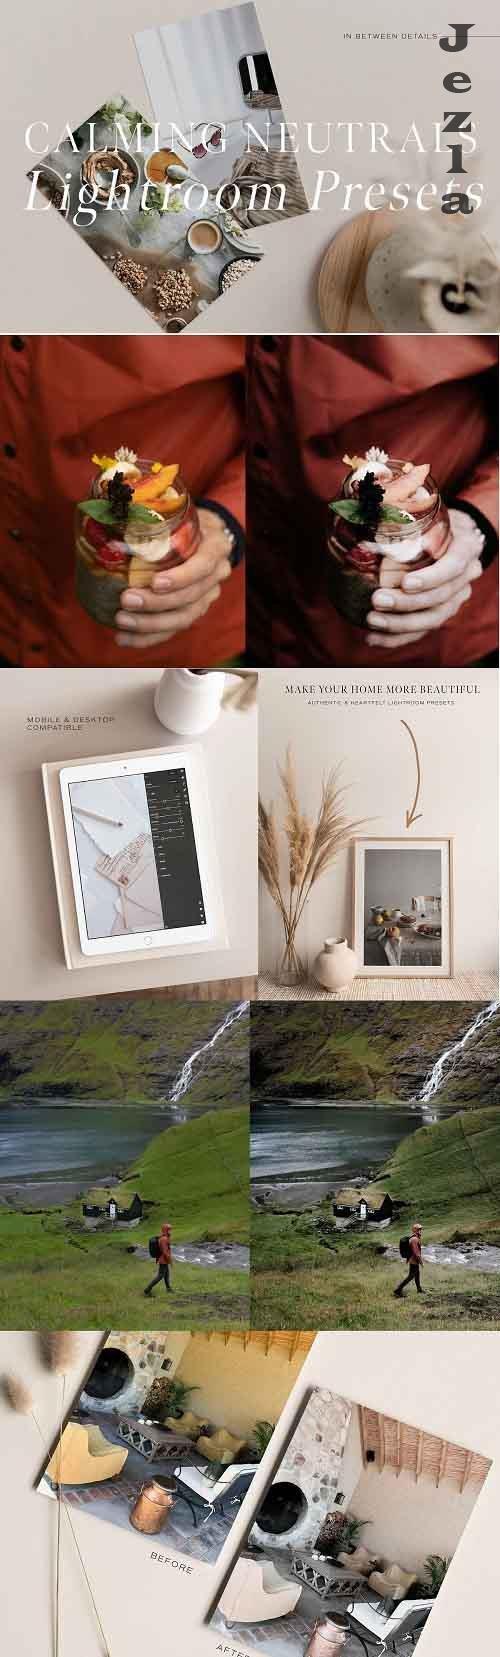 CreativeMarket - Calming Neutrals Lightroom Presets 4935953